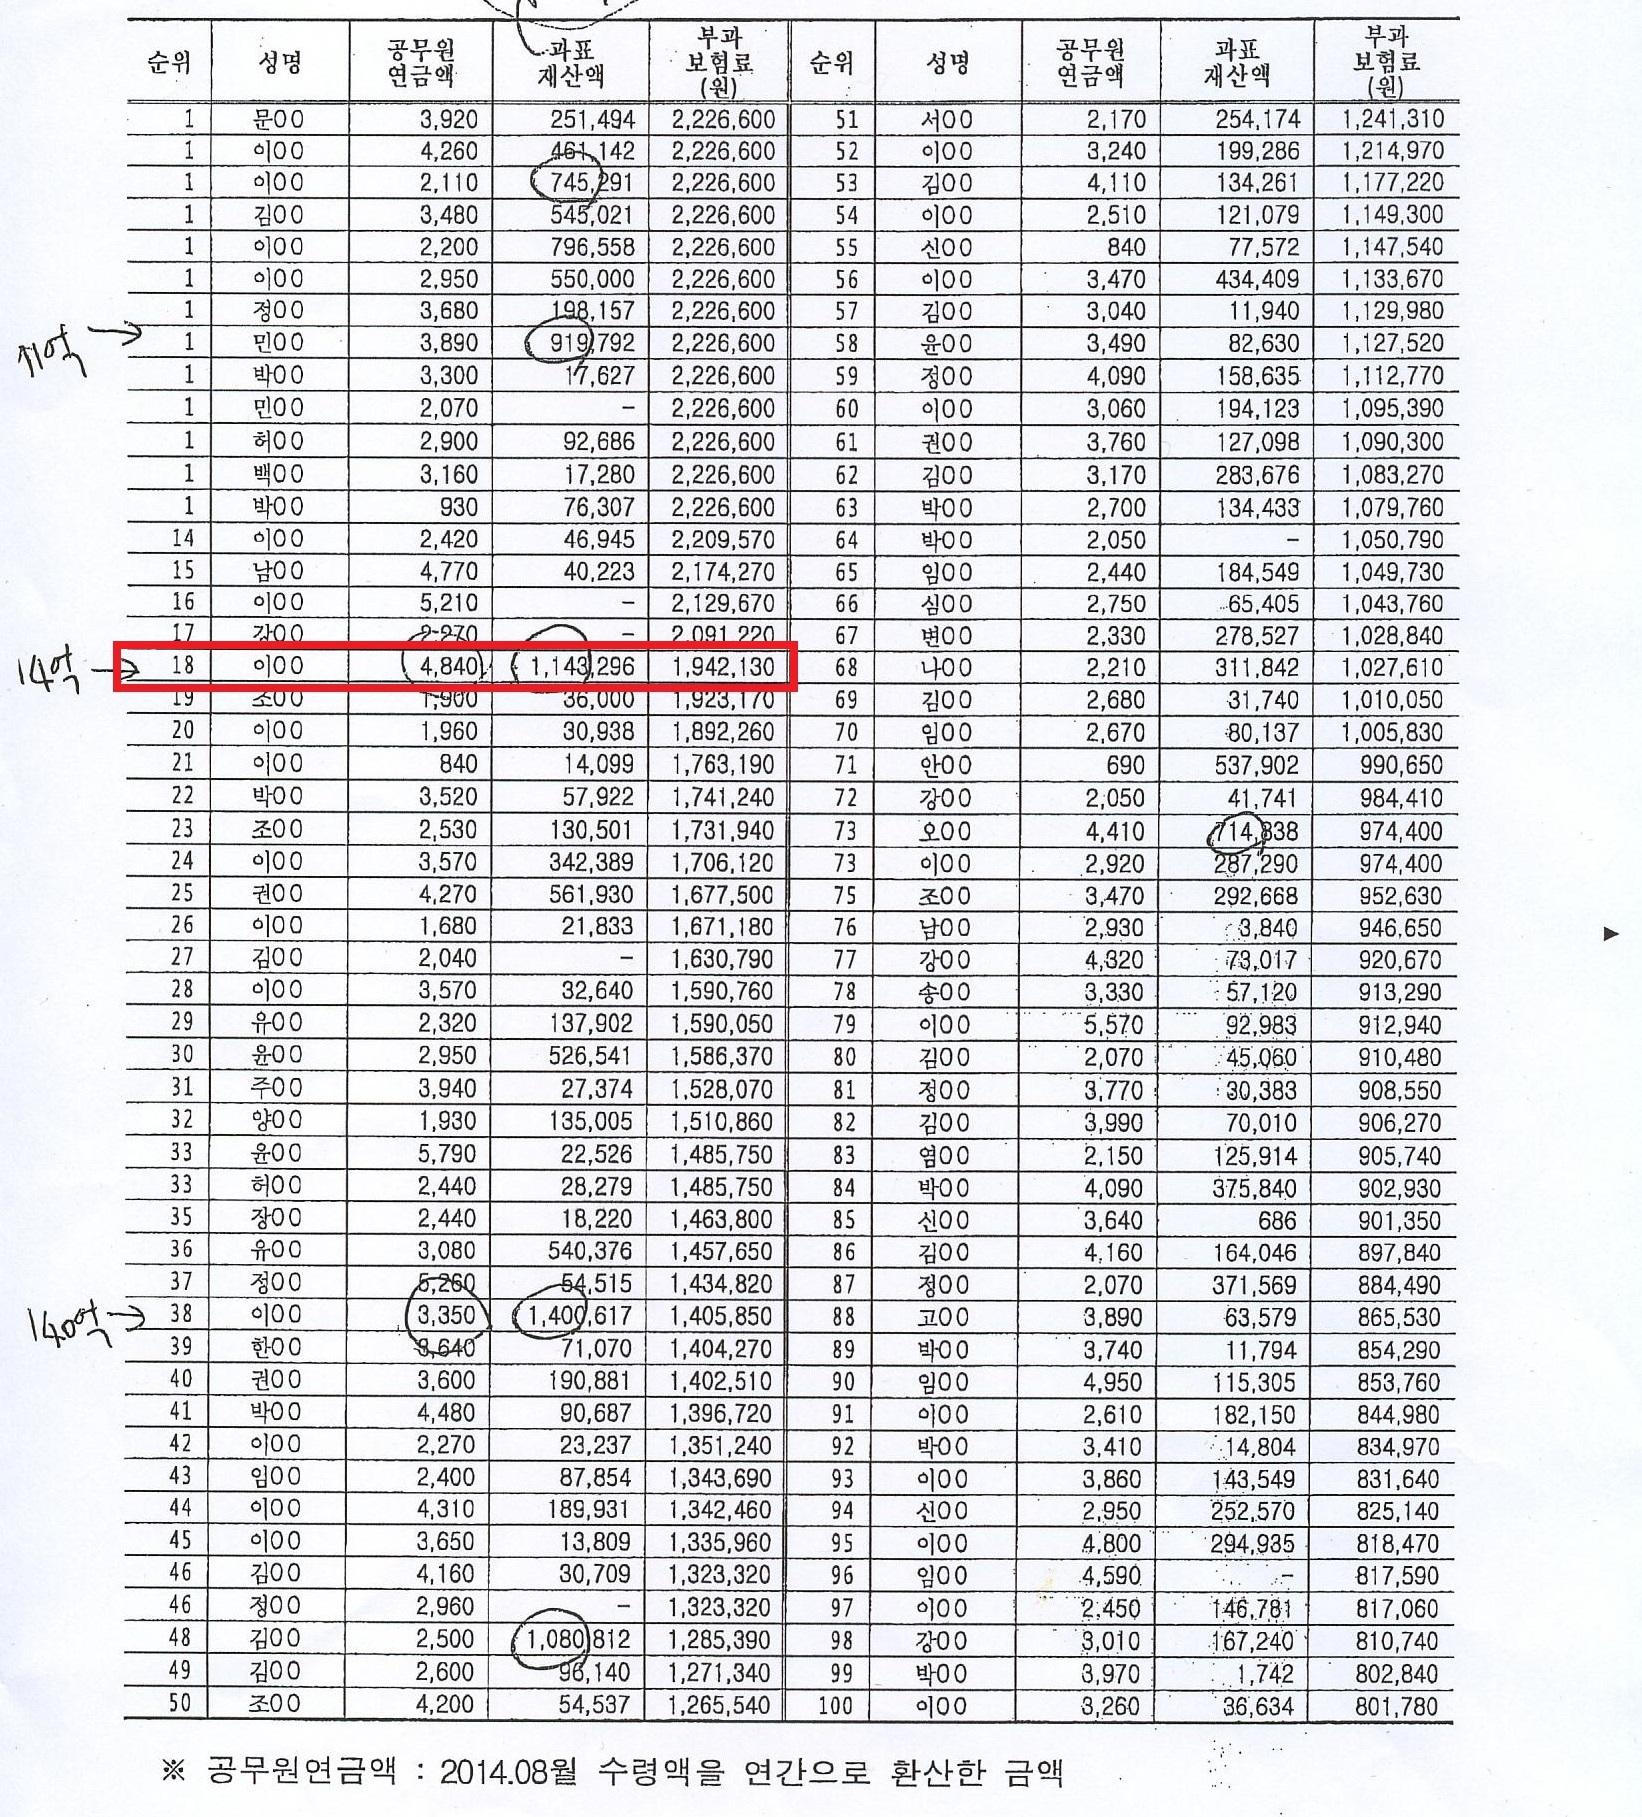 Scan10499.JPG